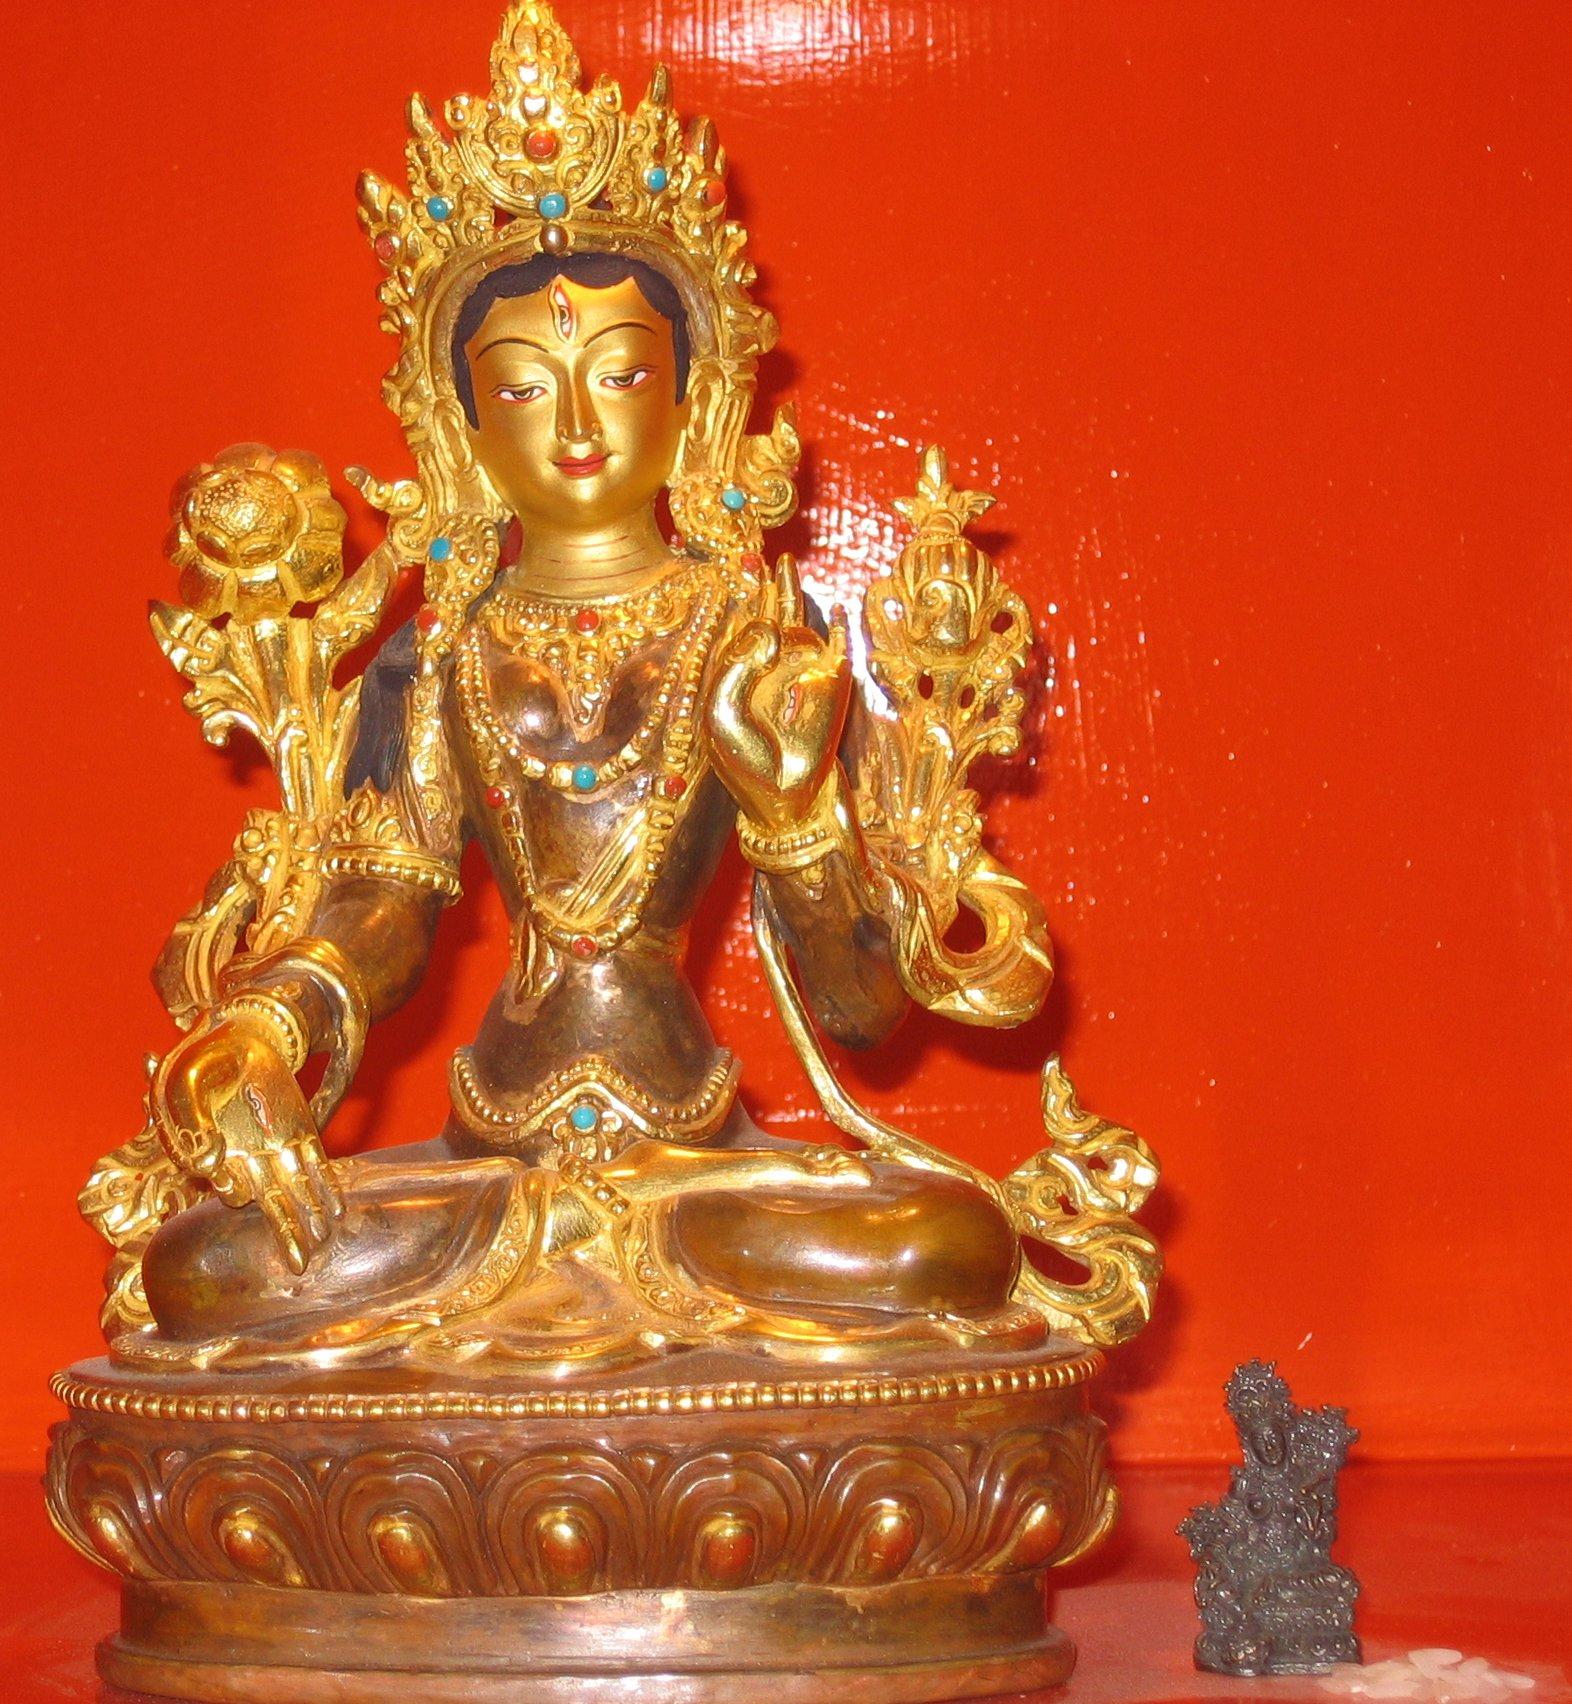 Buddhism: Maria & Robin Chants